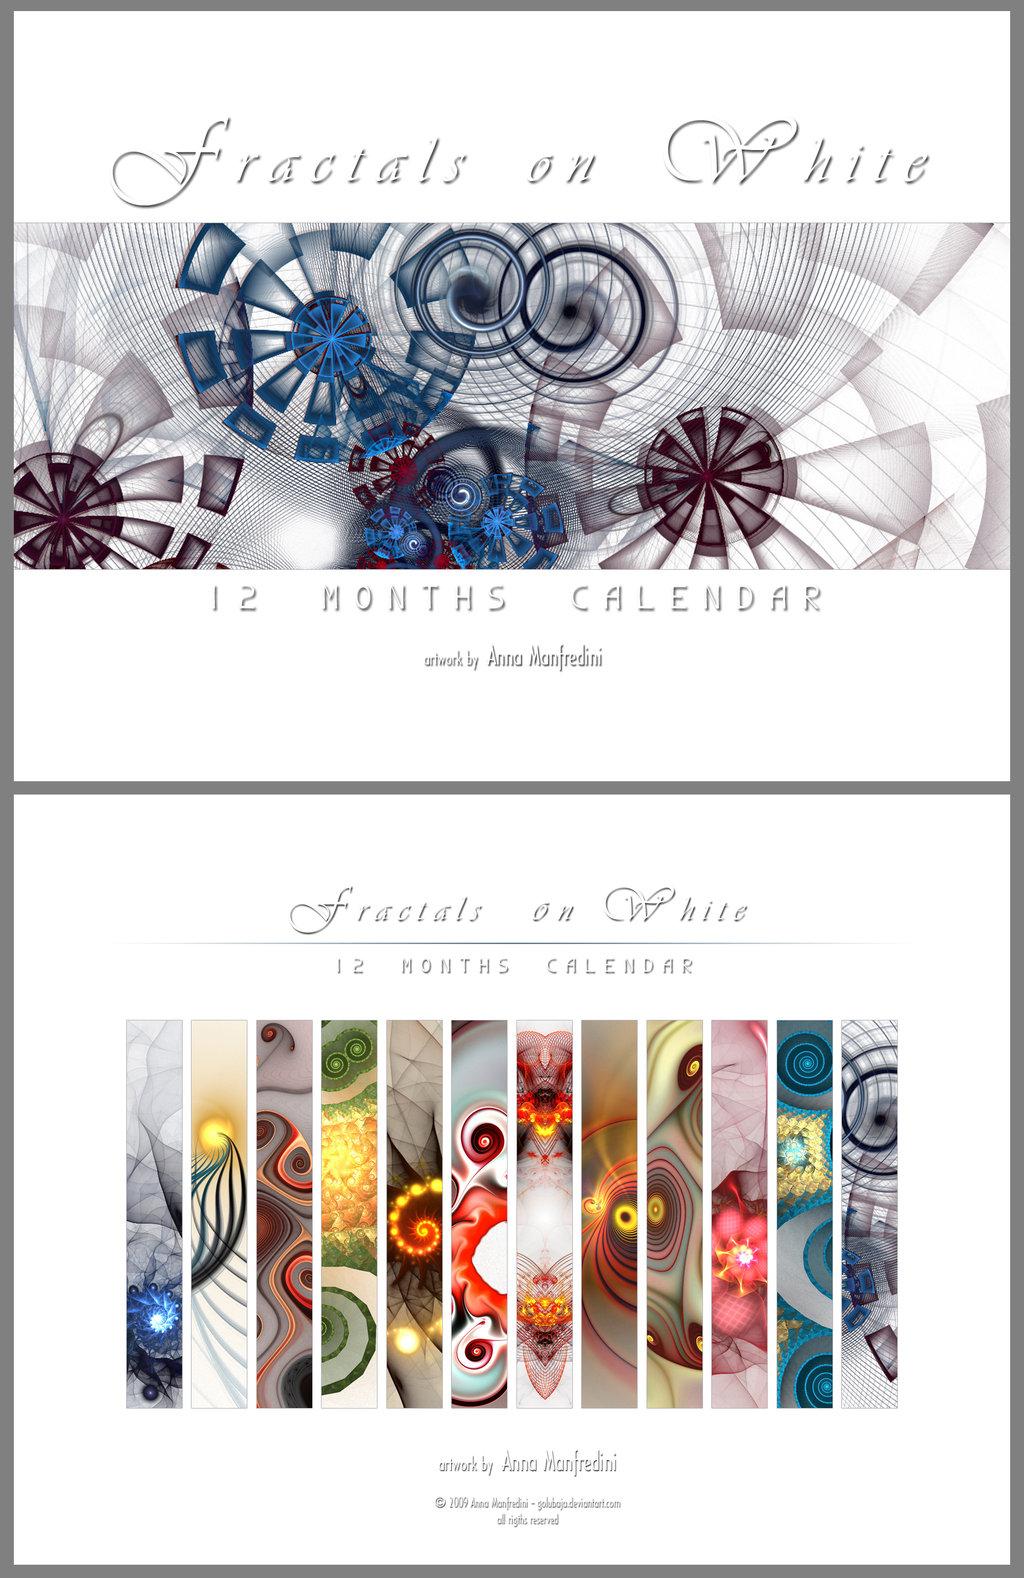 Fractals on White - Calendar by Golubaja